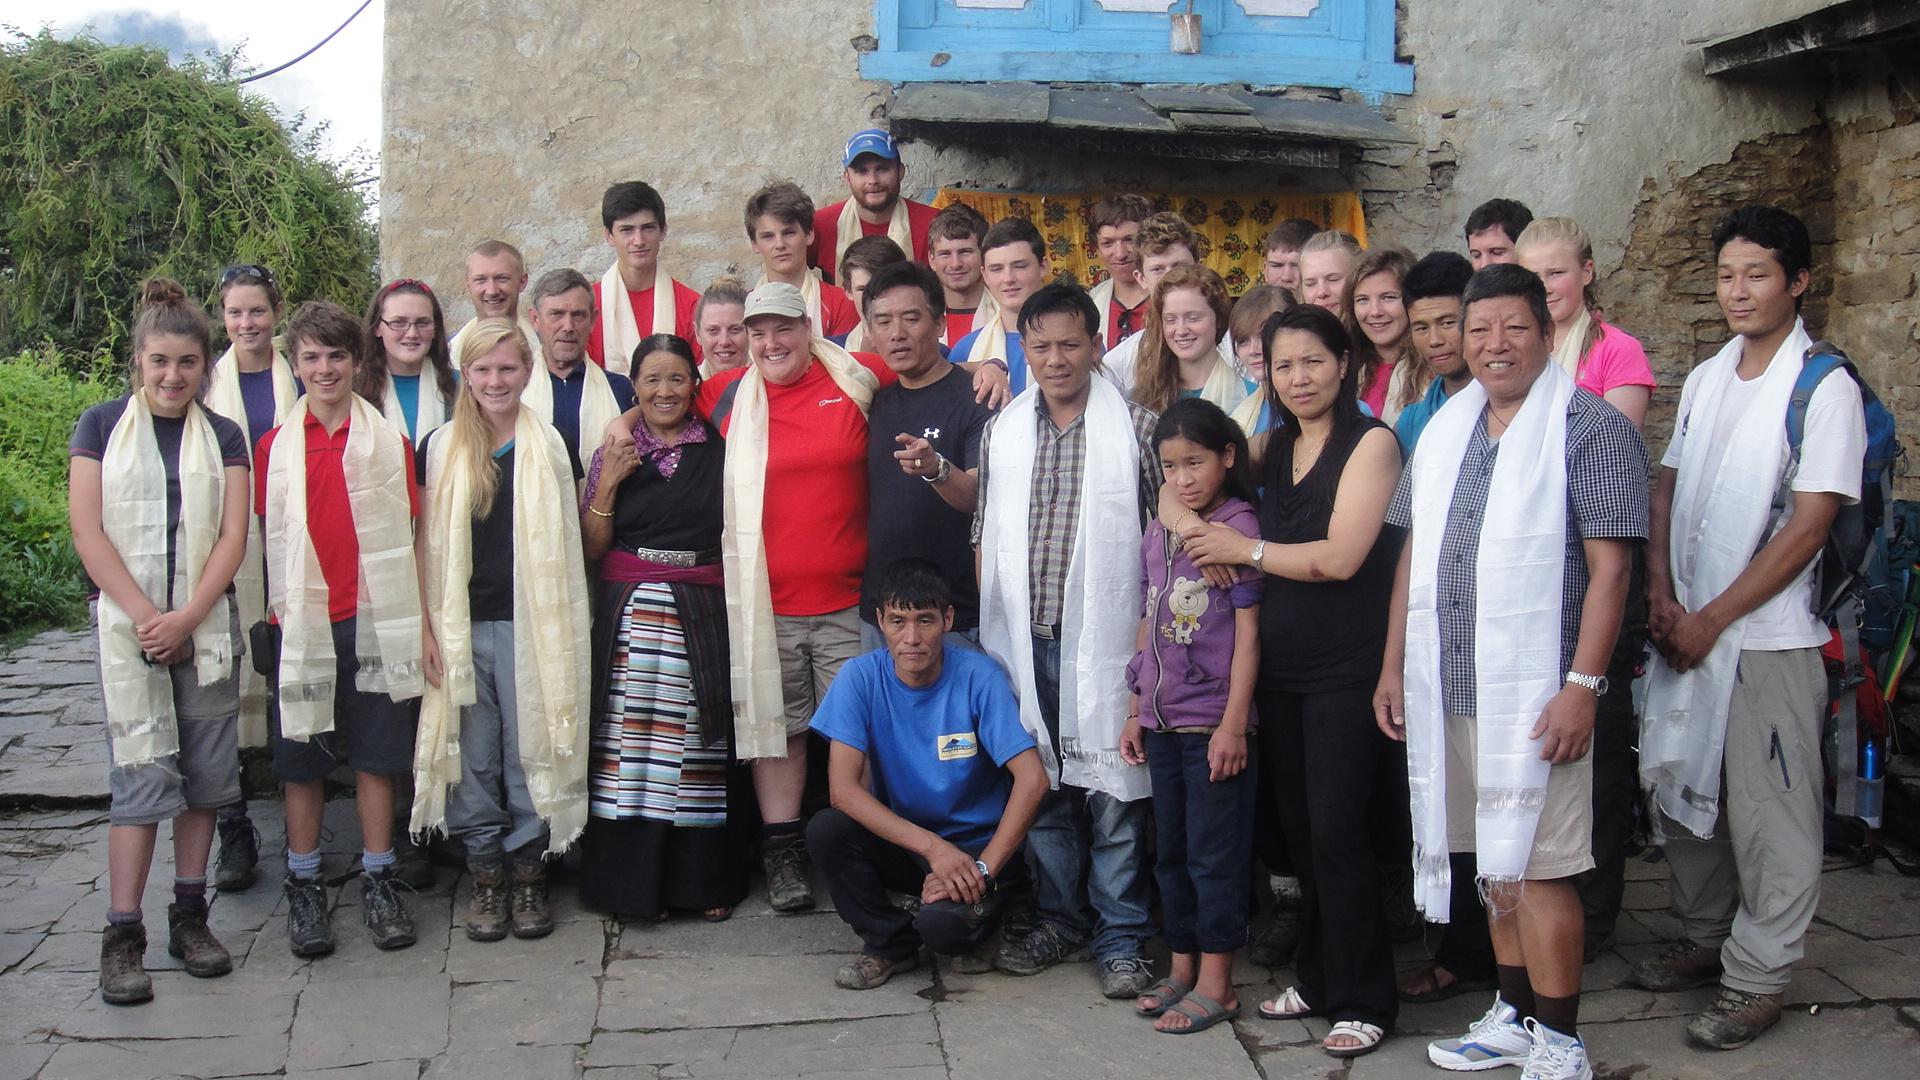 Medical_Students_Volunteer_Team_Adventure_Alternative_Nepal.JPG